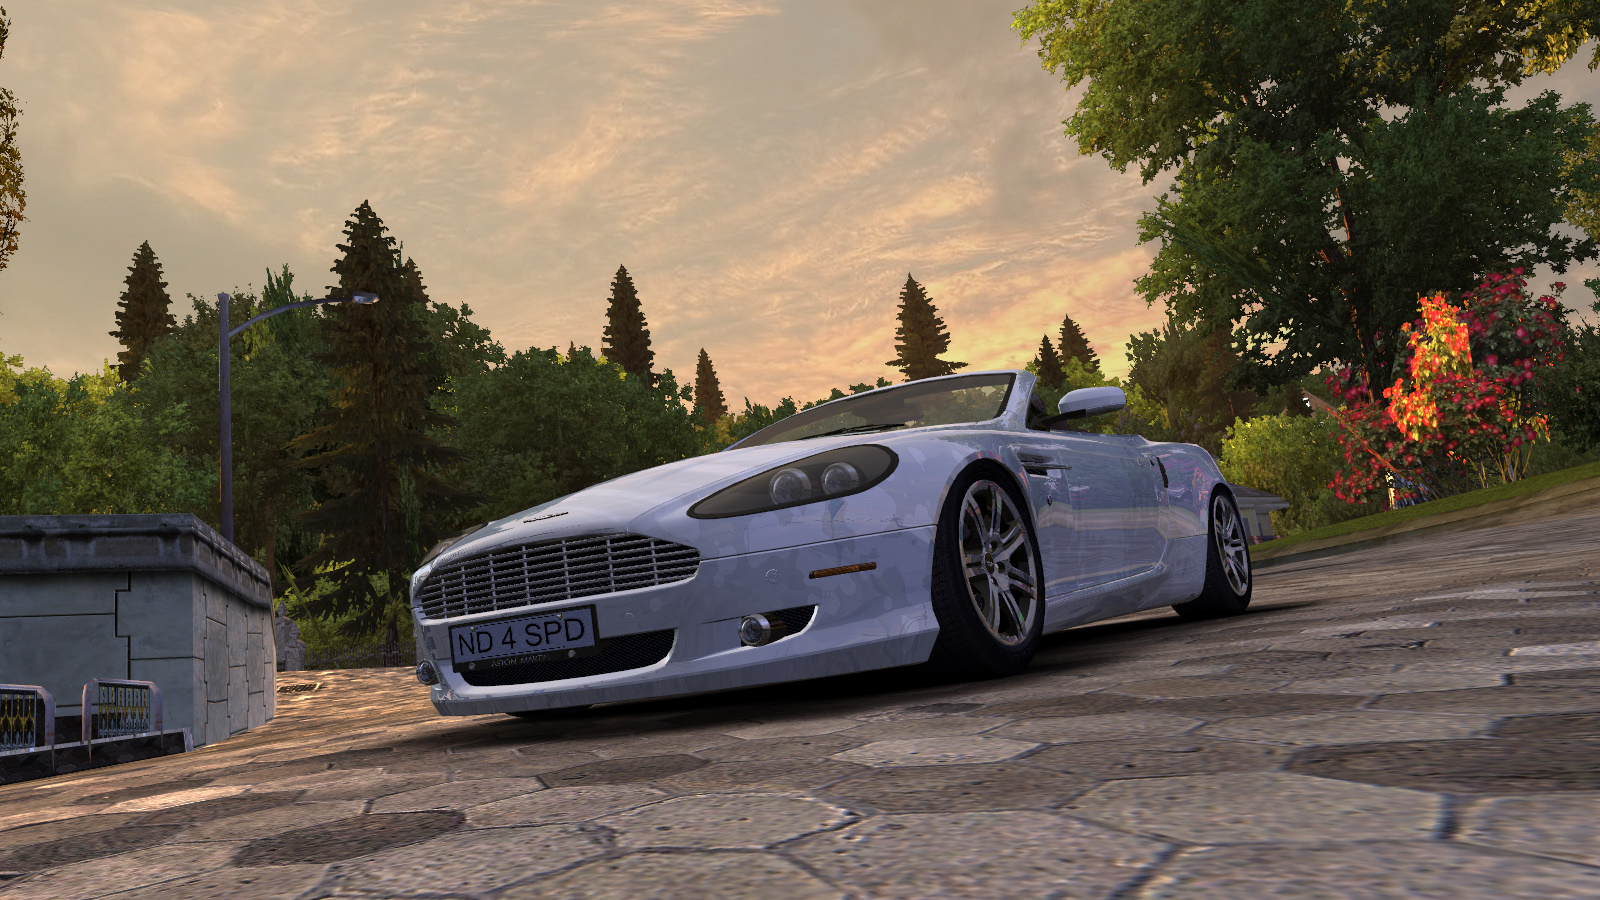 Aston Martin DB9 Volante by Alex.Ka. - Need for Speed: Most Wanted (2005) Автомобиль